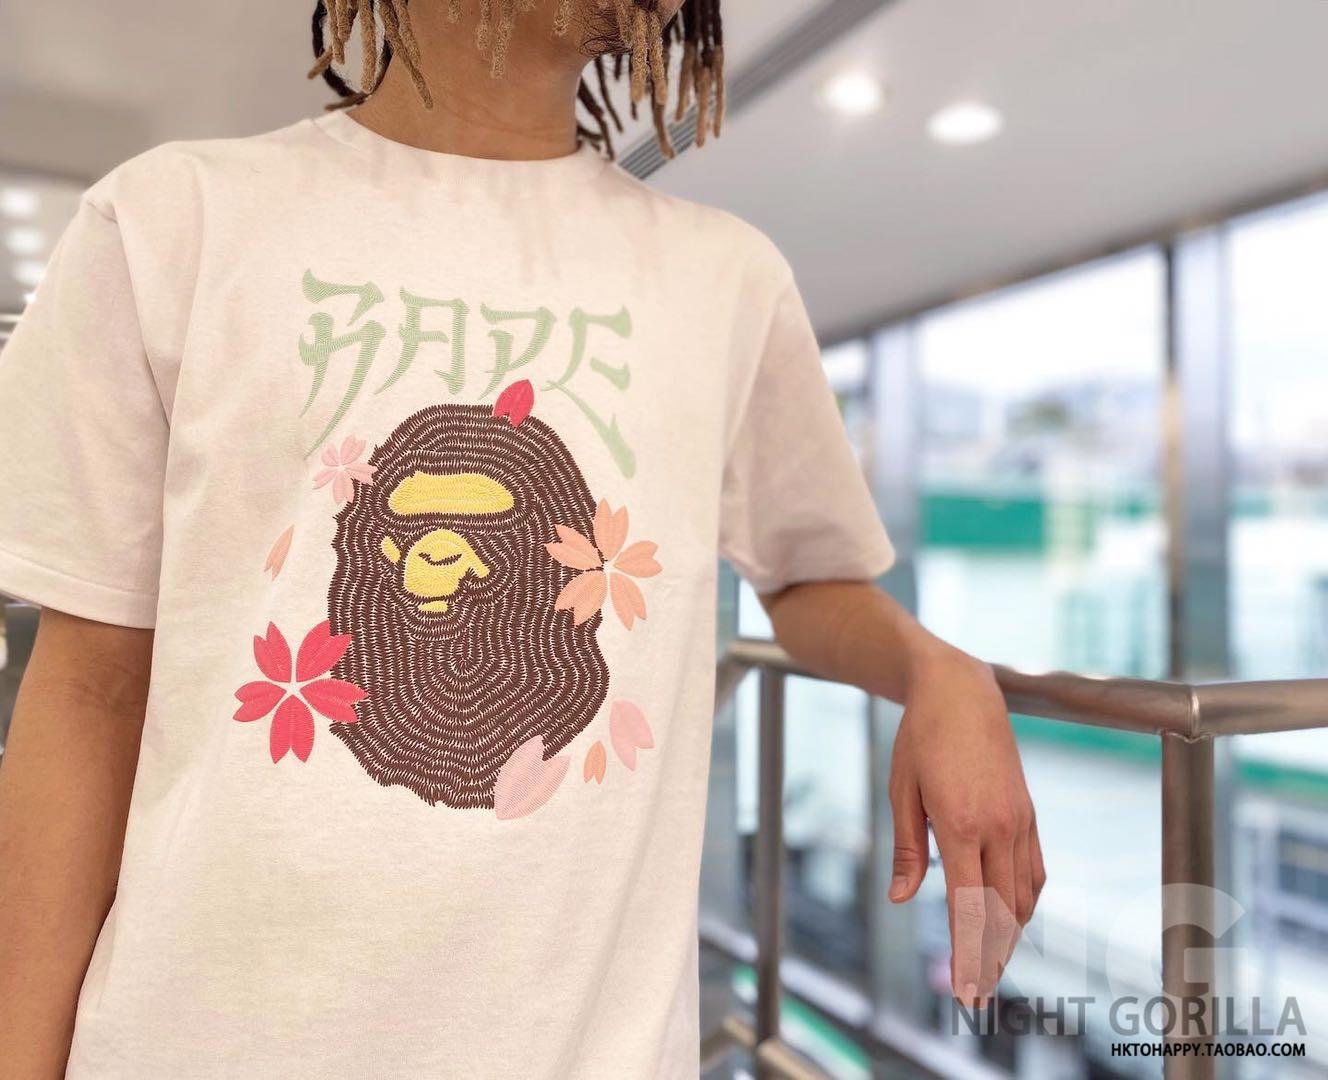 NG歡歡香港潮牌 BAPE 20夏季男女CP櫻花猿人頭刺繡短袖T恤110082